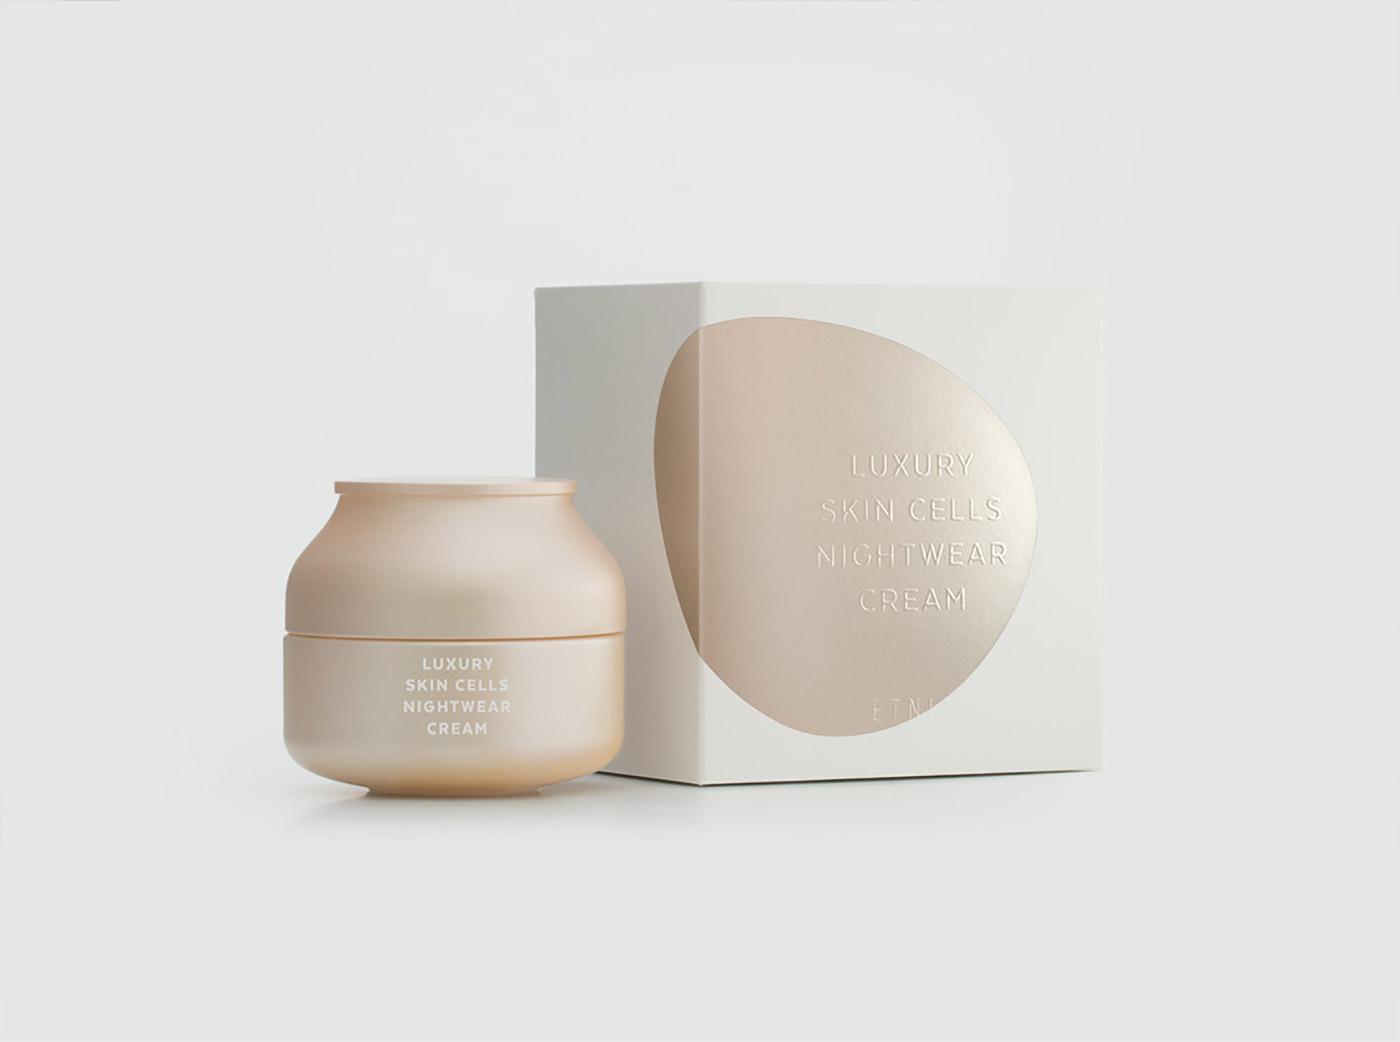 Luxury Skin Care Packaging Mindsparkle Mag